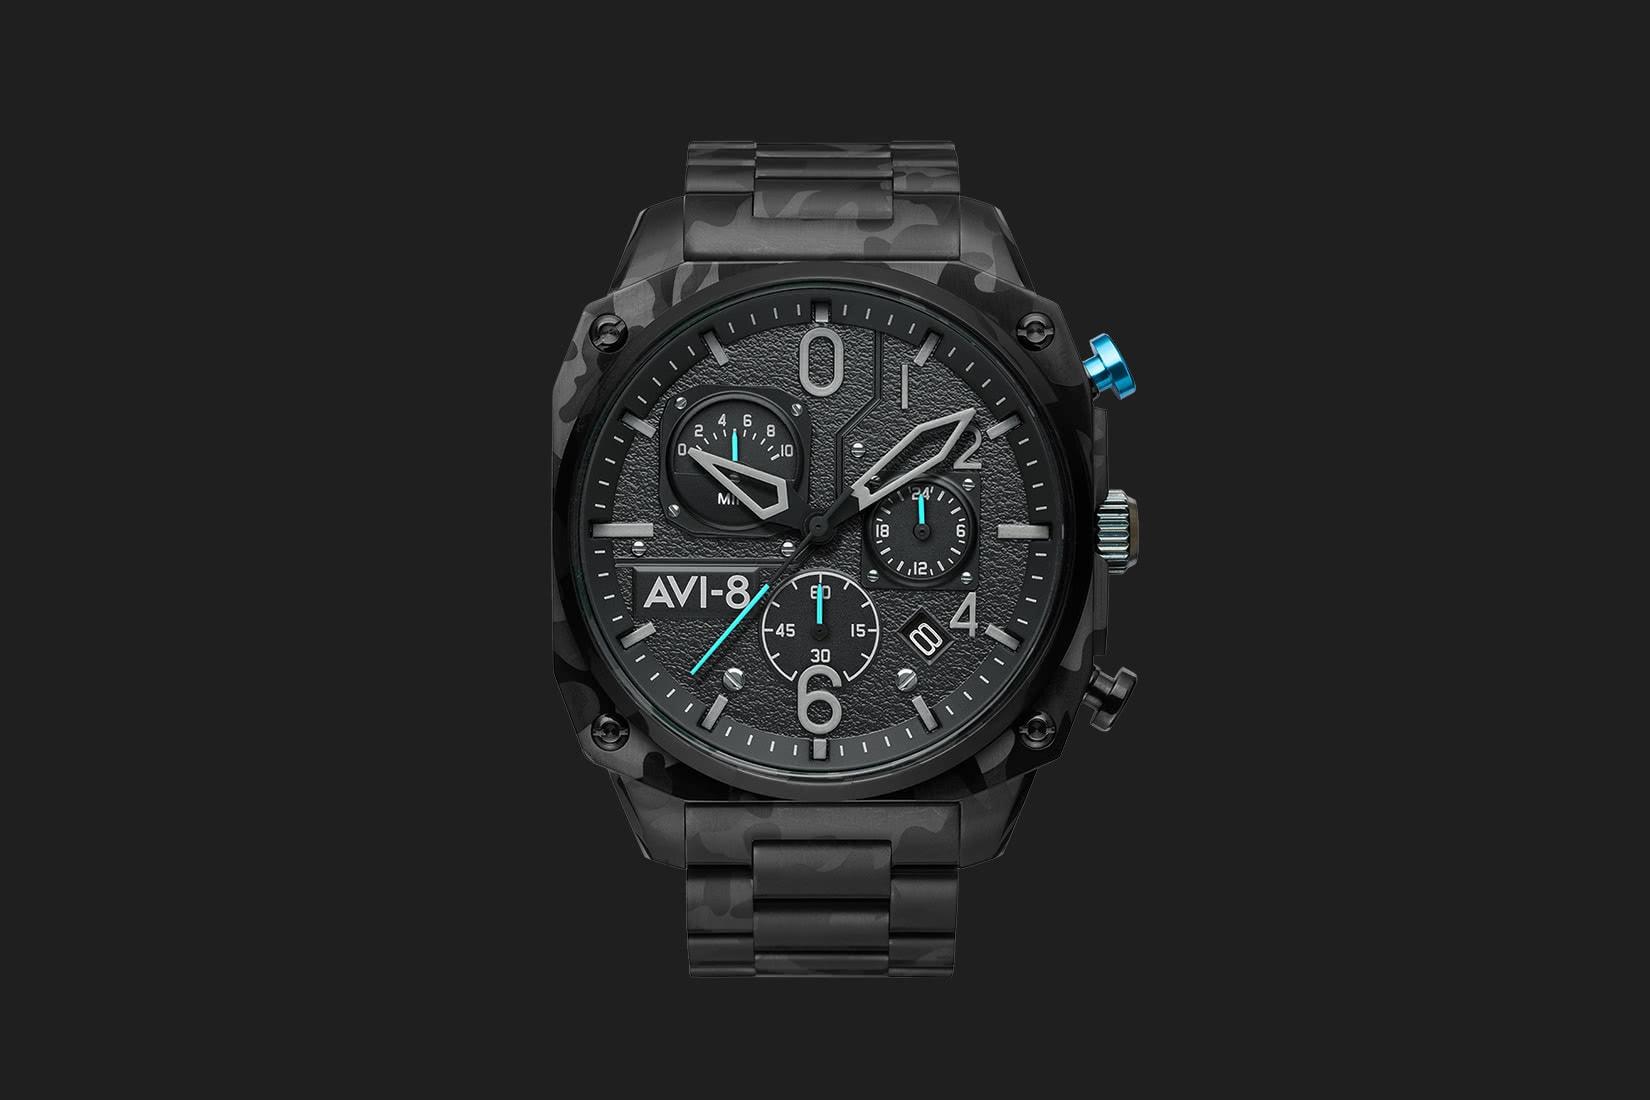 best men watches avi-8 retrograde chronograph review - Luxe Digital